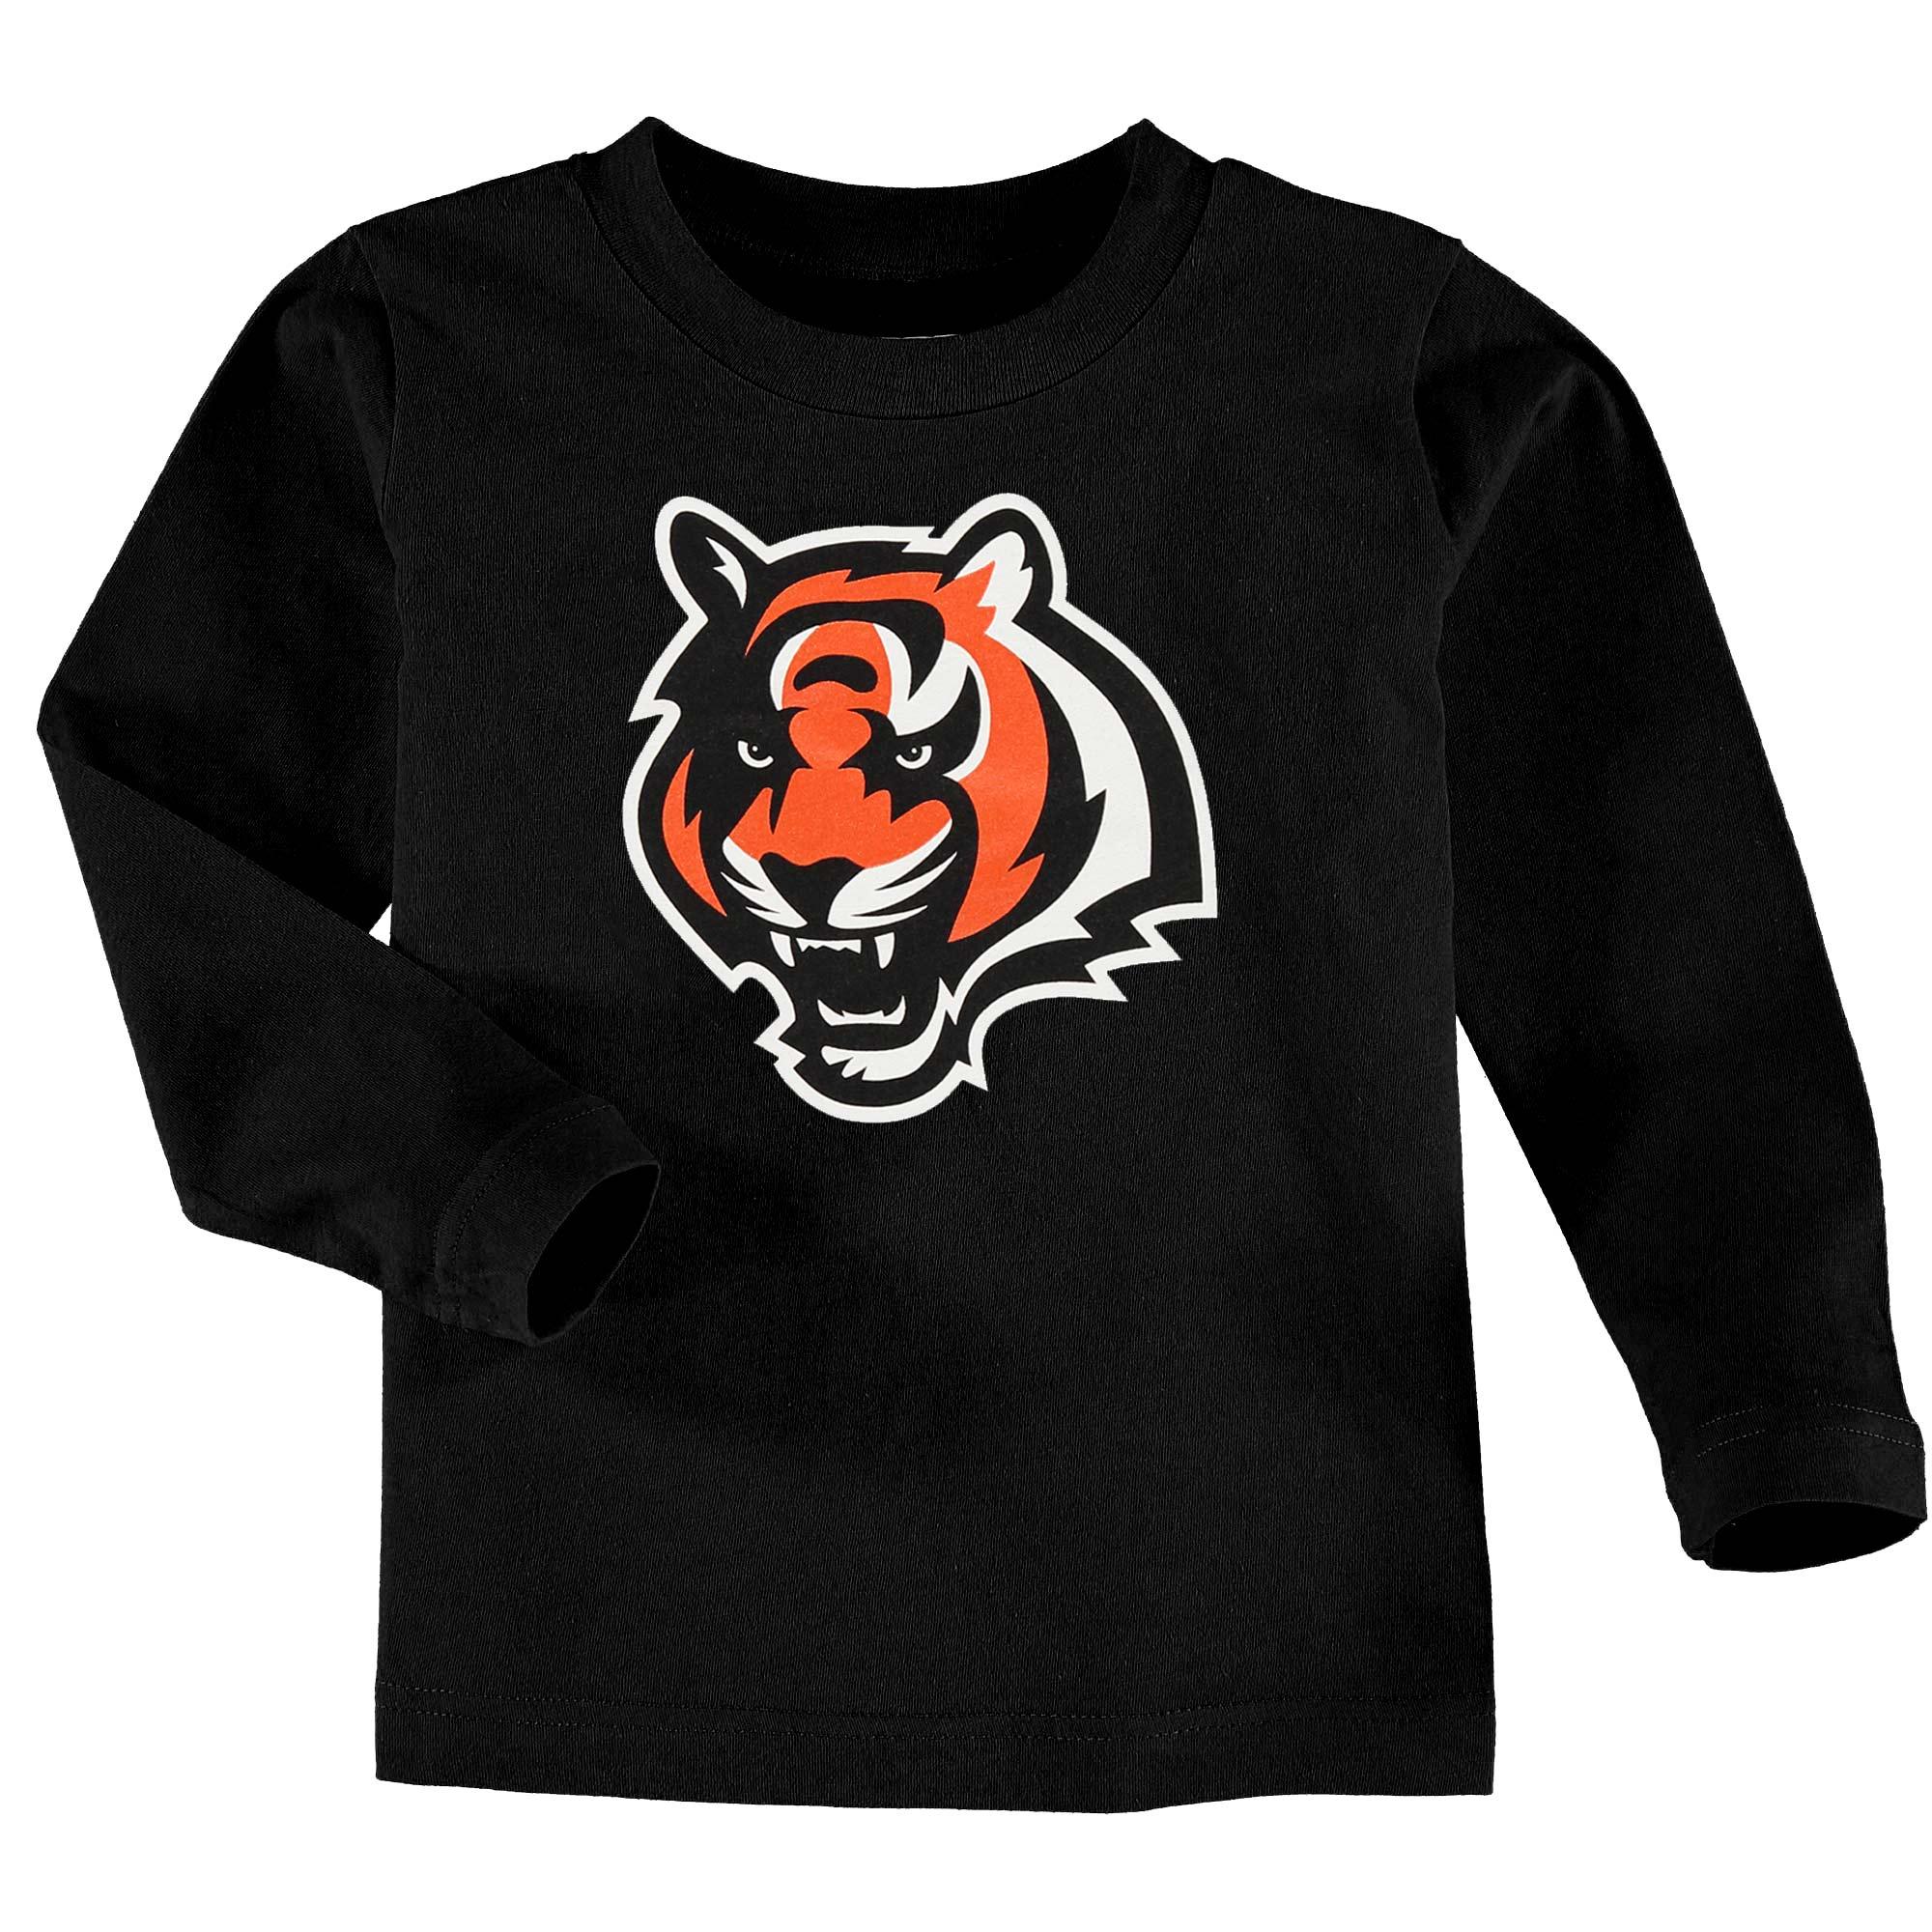 Cincinnati Bengals Toddler Team Logo Long Sleeve T-Shirt - Black